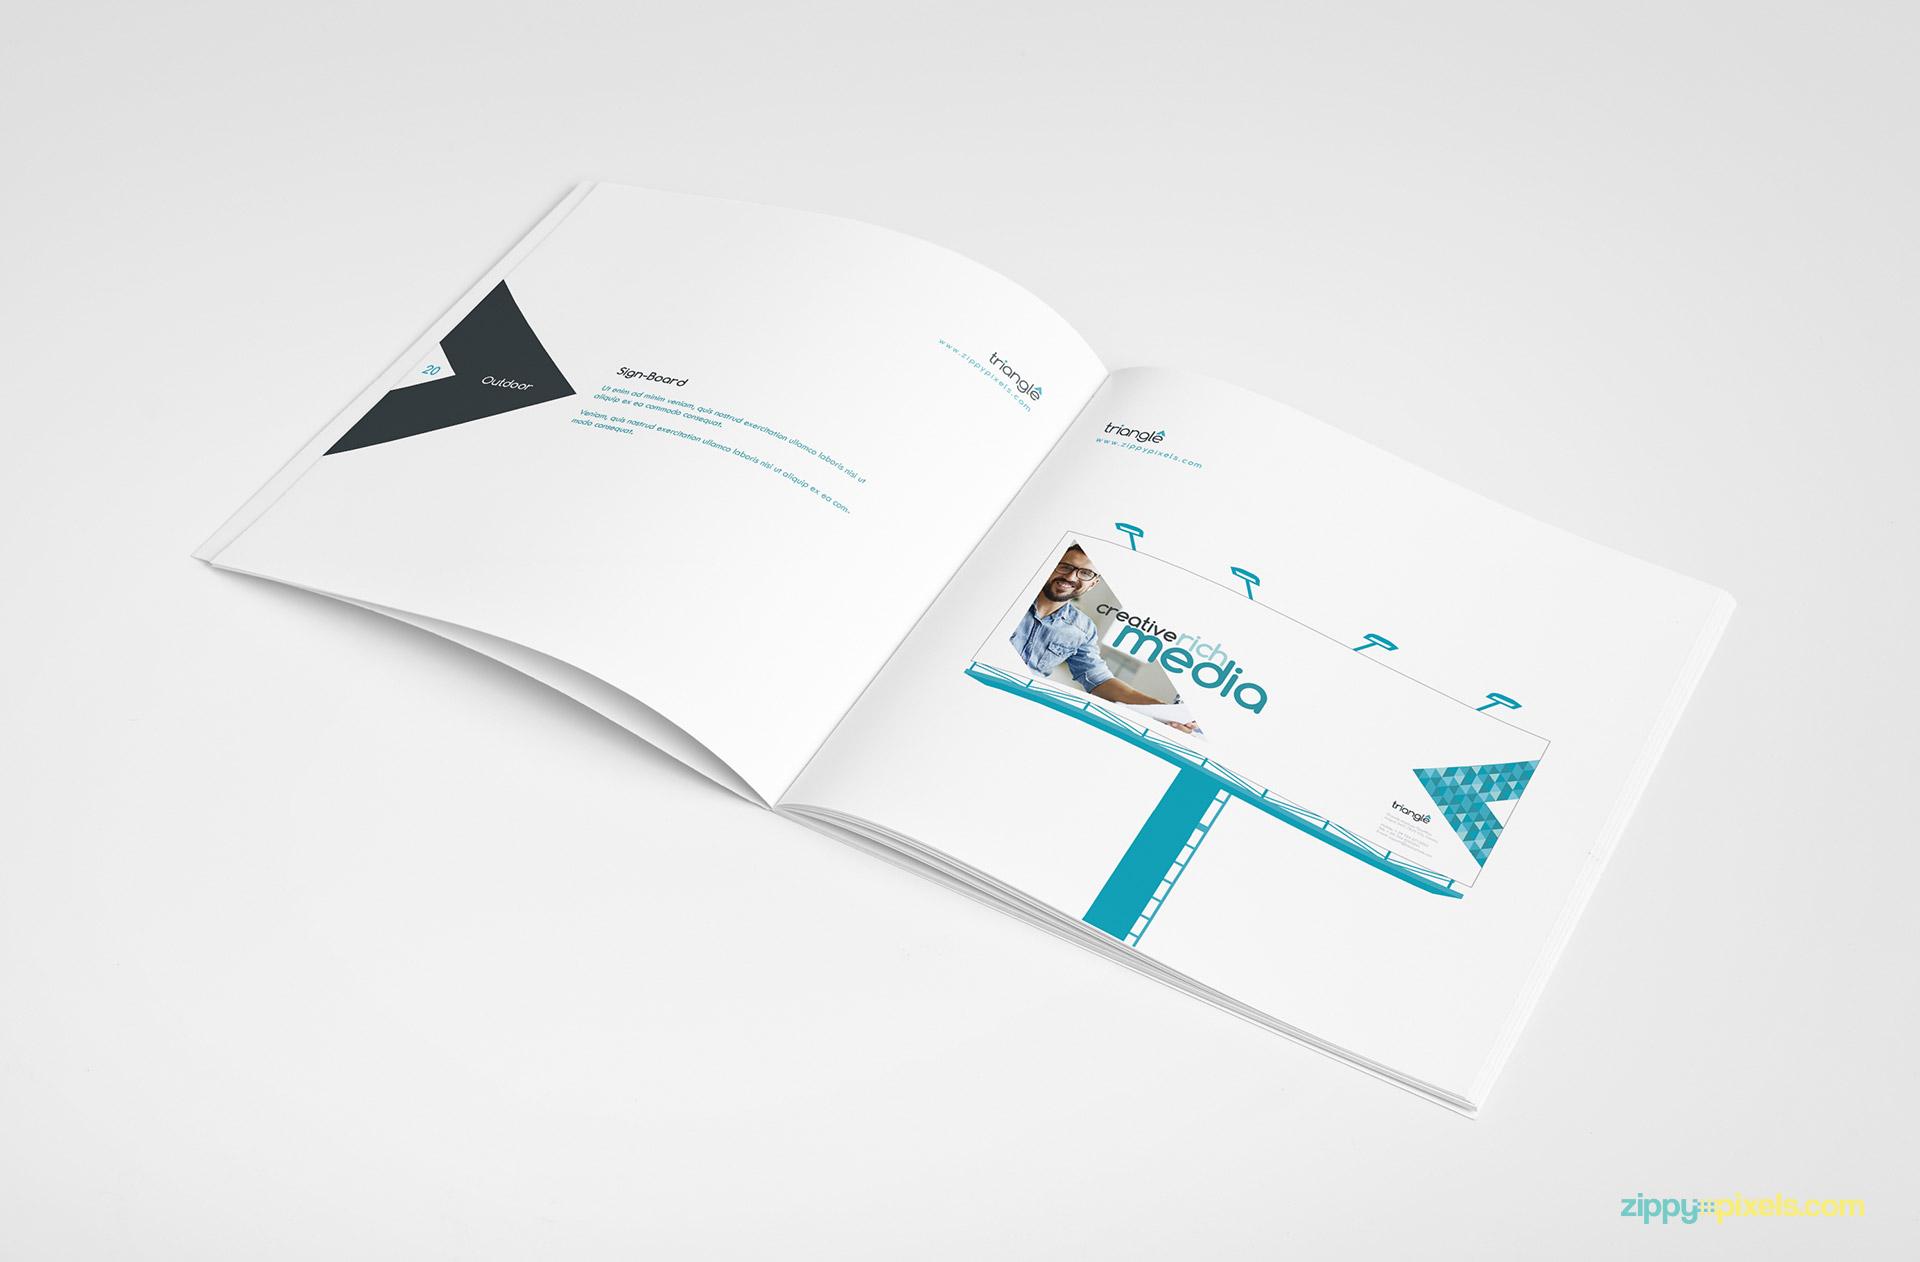 13-brand-book-11-outdoor